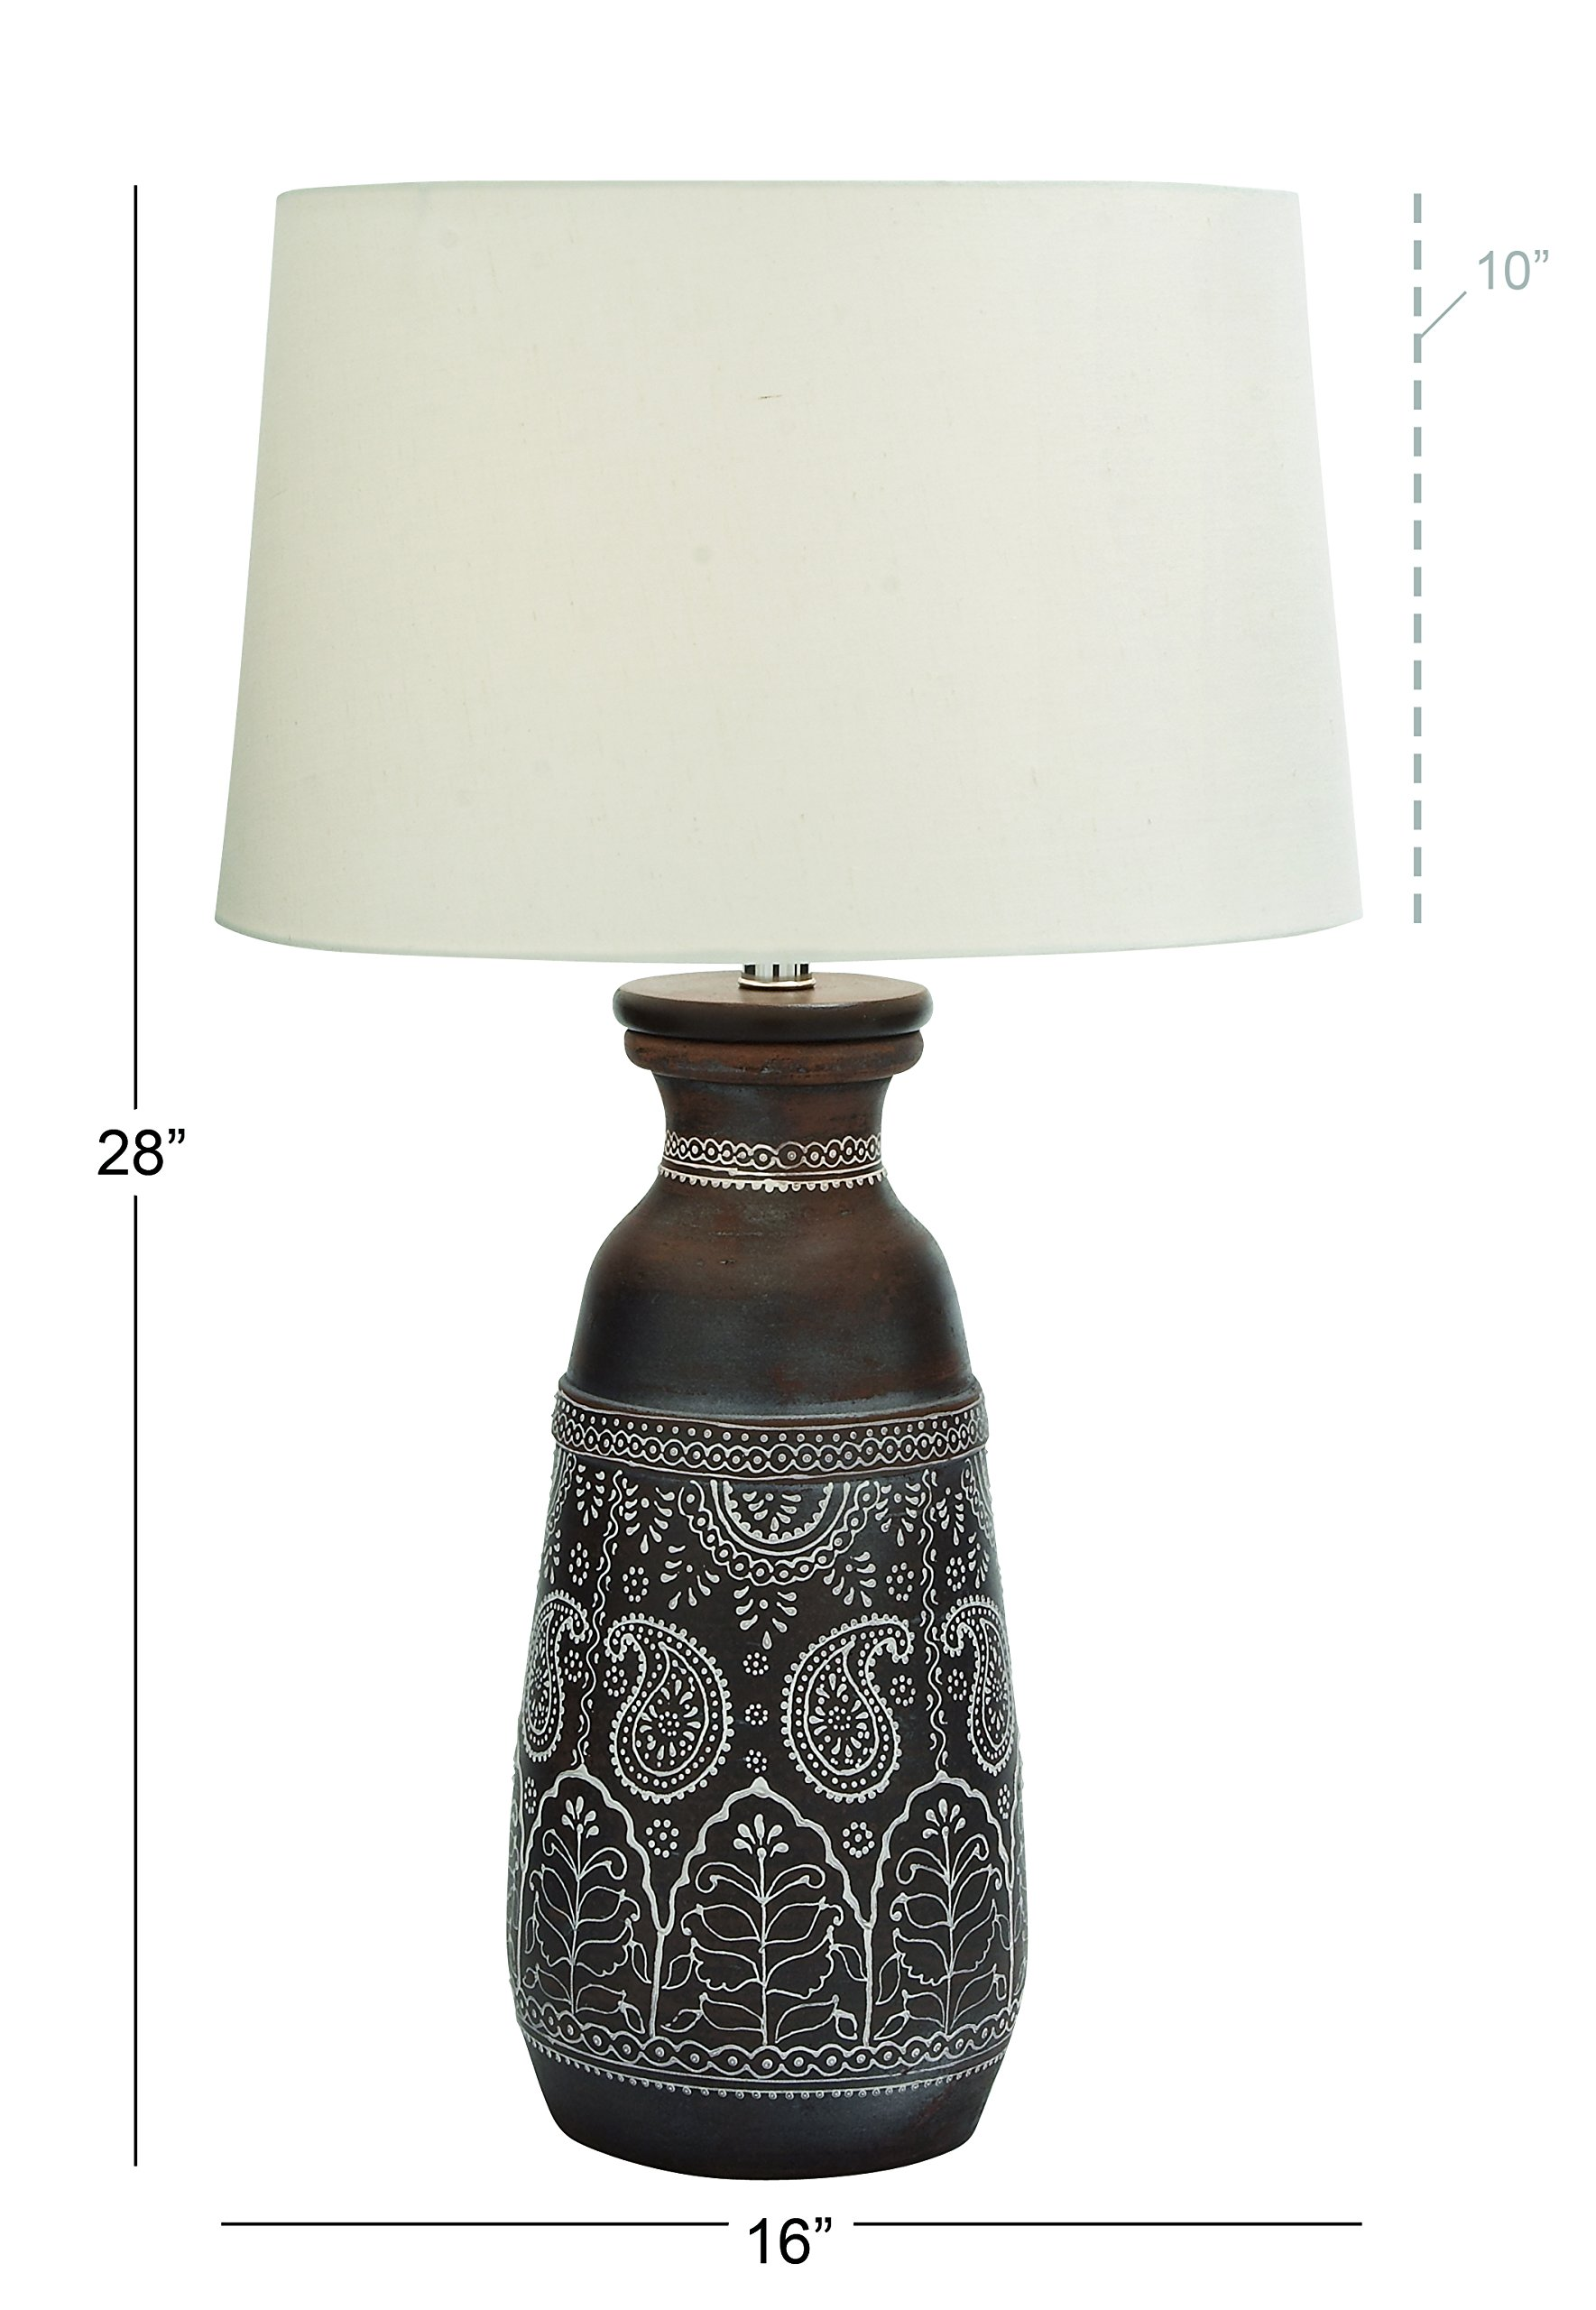 Deco 79 94425 Terracotta Table Lamp, 28''